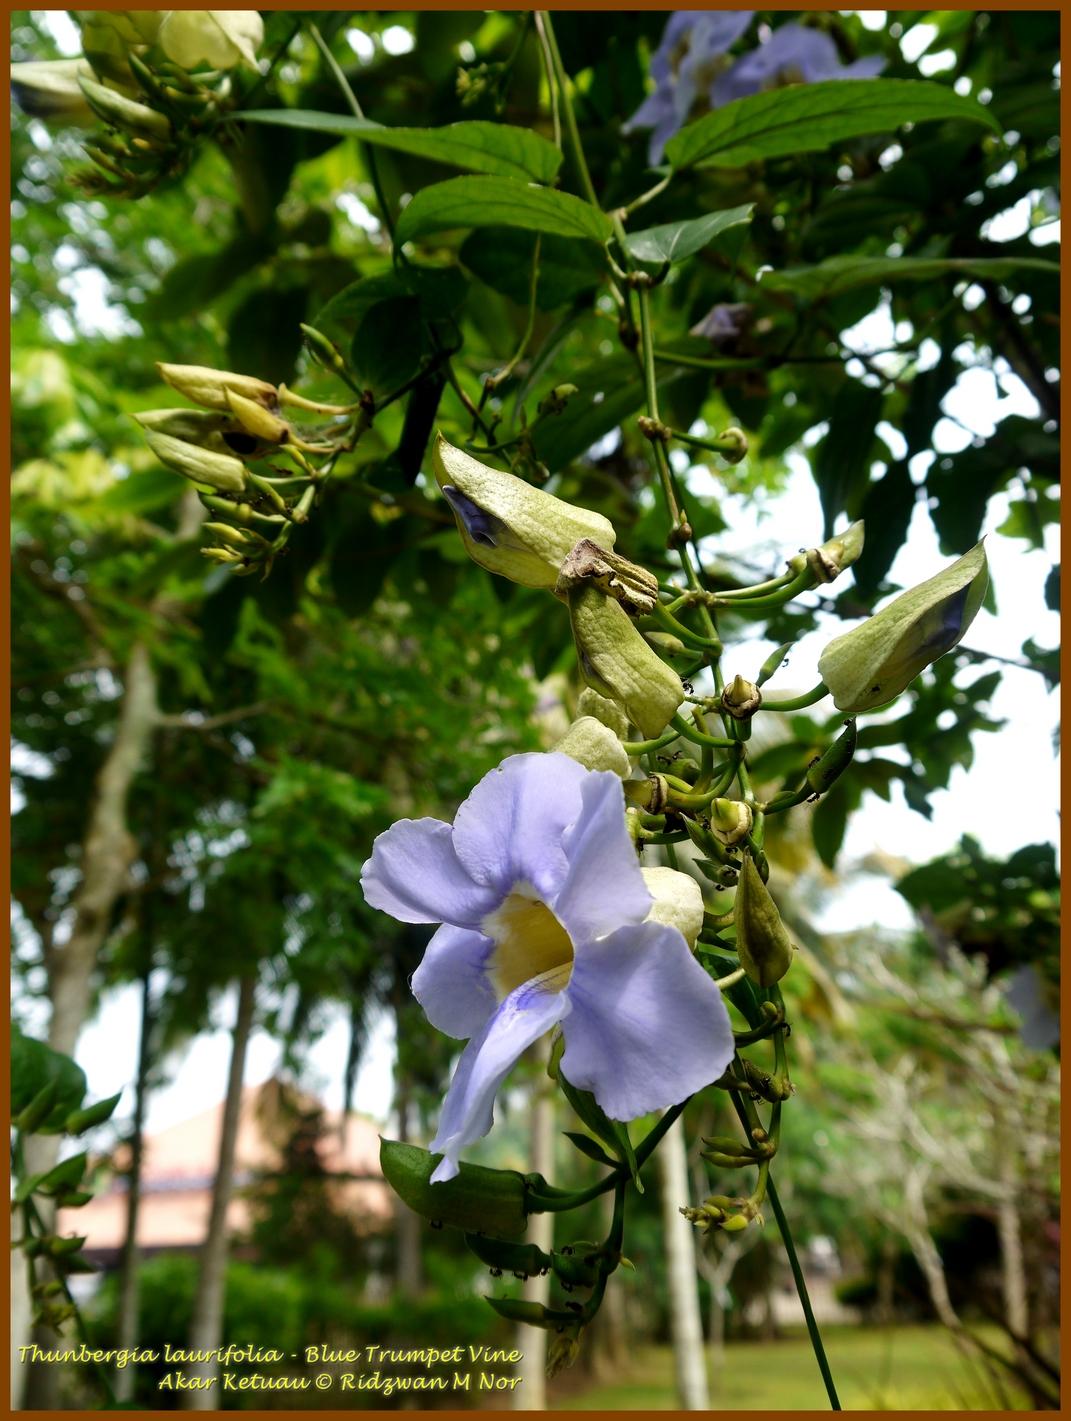 Thunbergia laurifolia akar ketuau blue trumpet vine blue sky vine thunbergia laurifolia akar ketuau blue trumpet vine blue sky vine izmirmasajfo Images